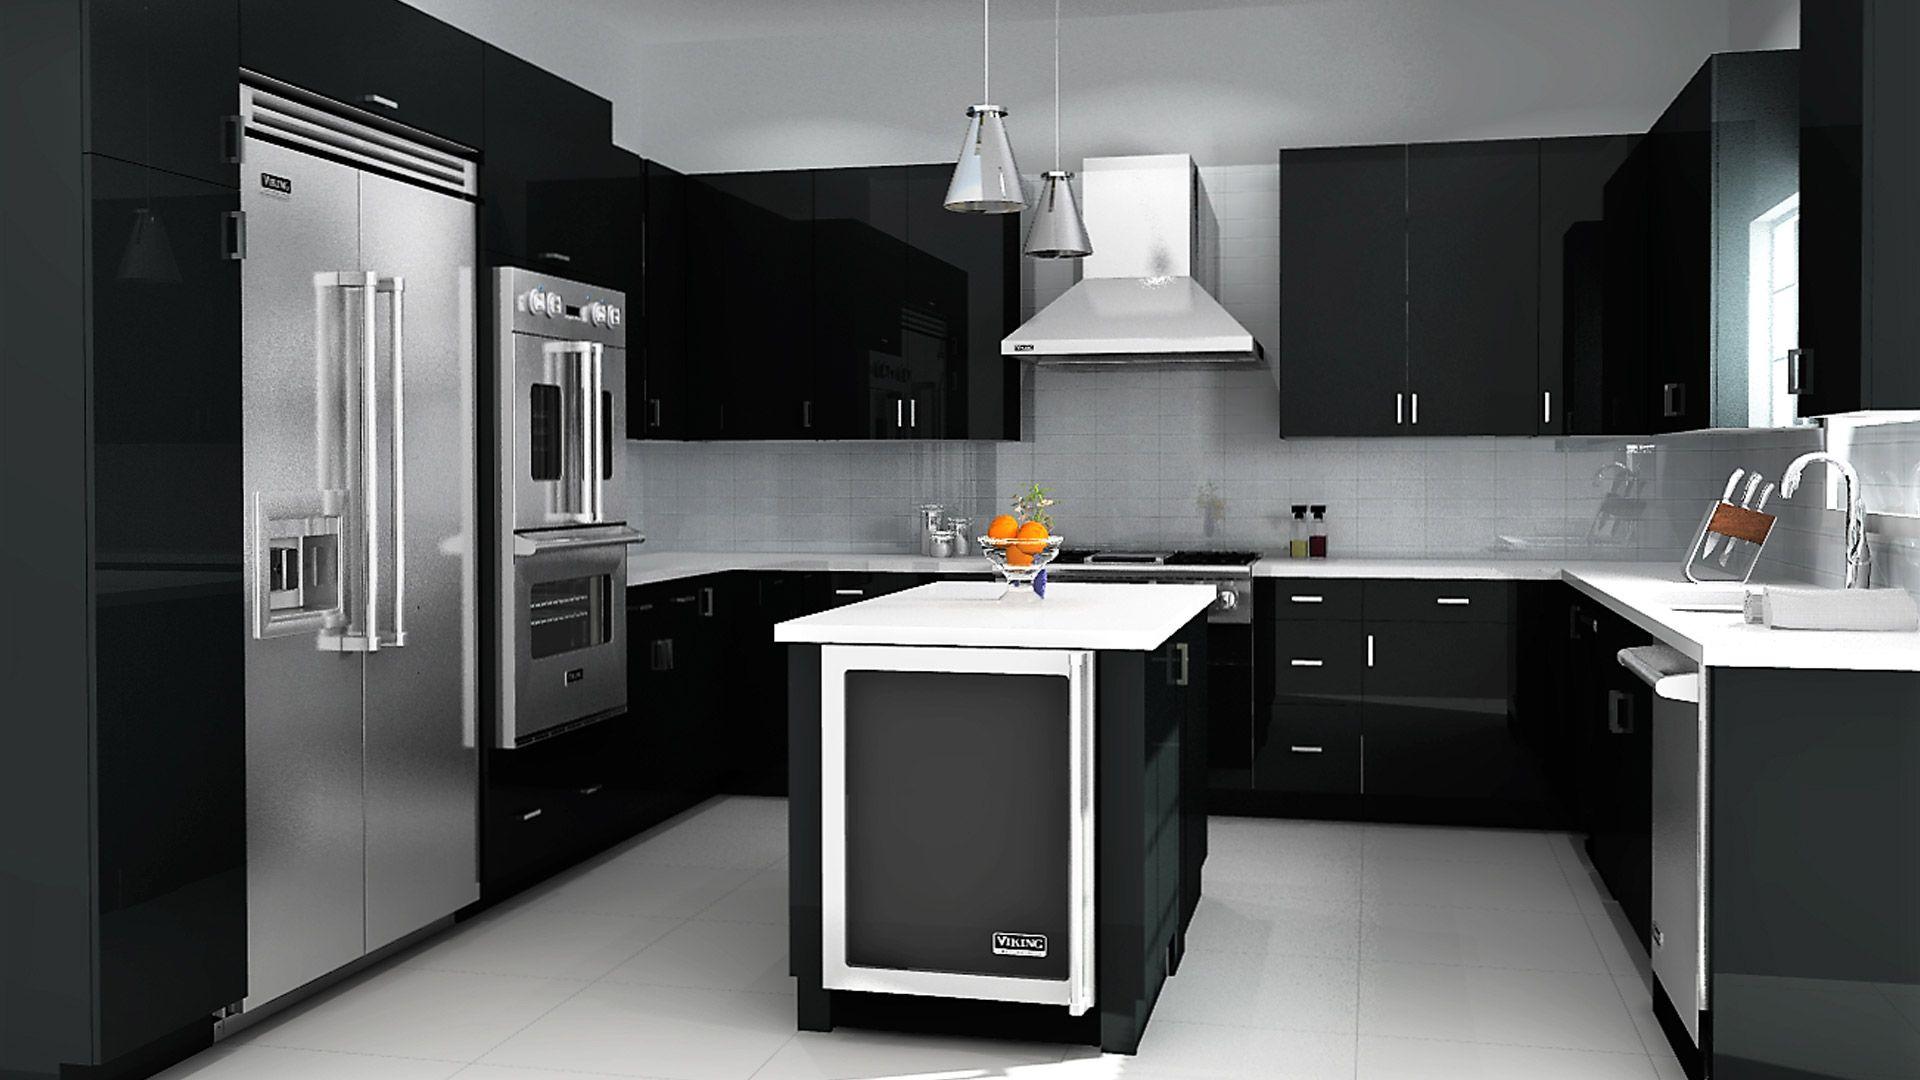 2020 Design | Kitchen inspiration design, Kitchen ...